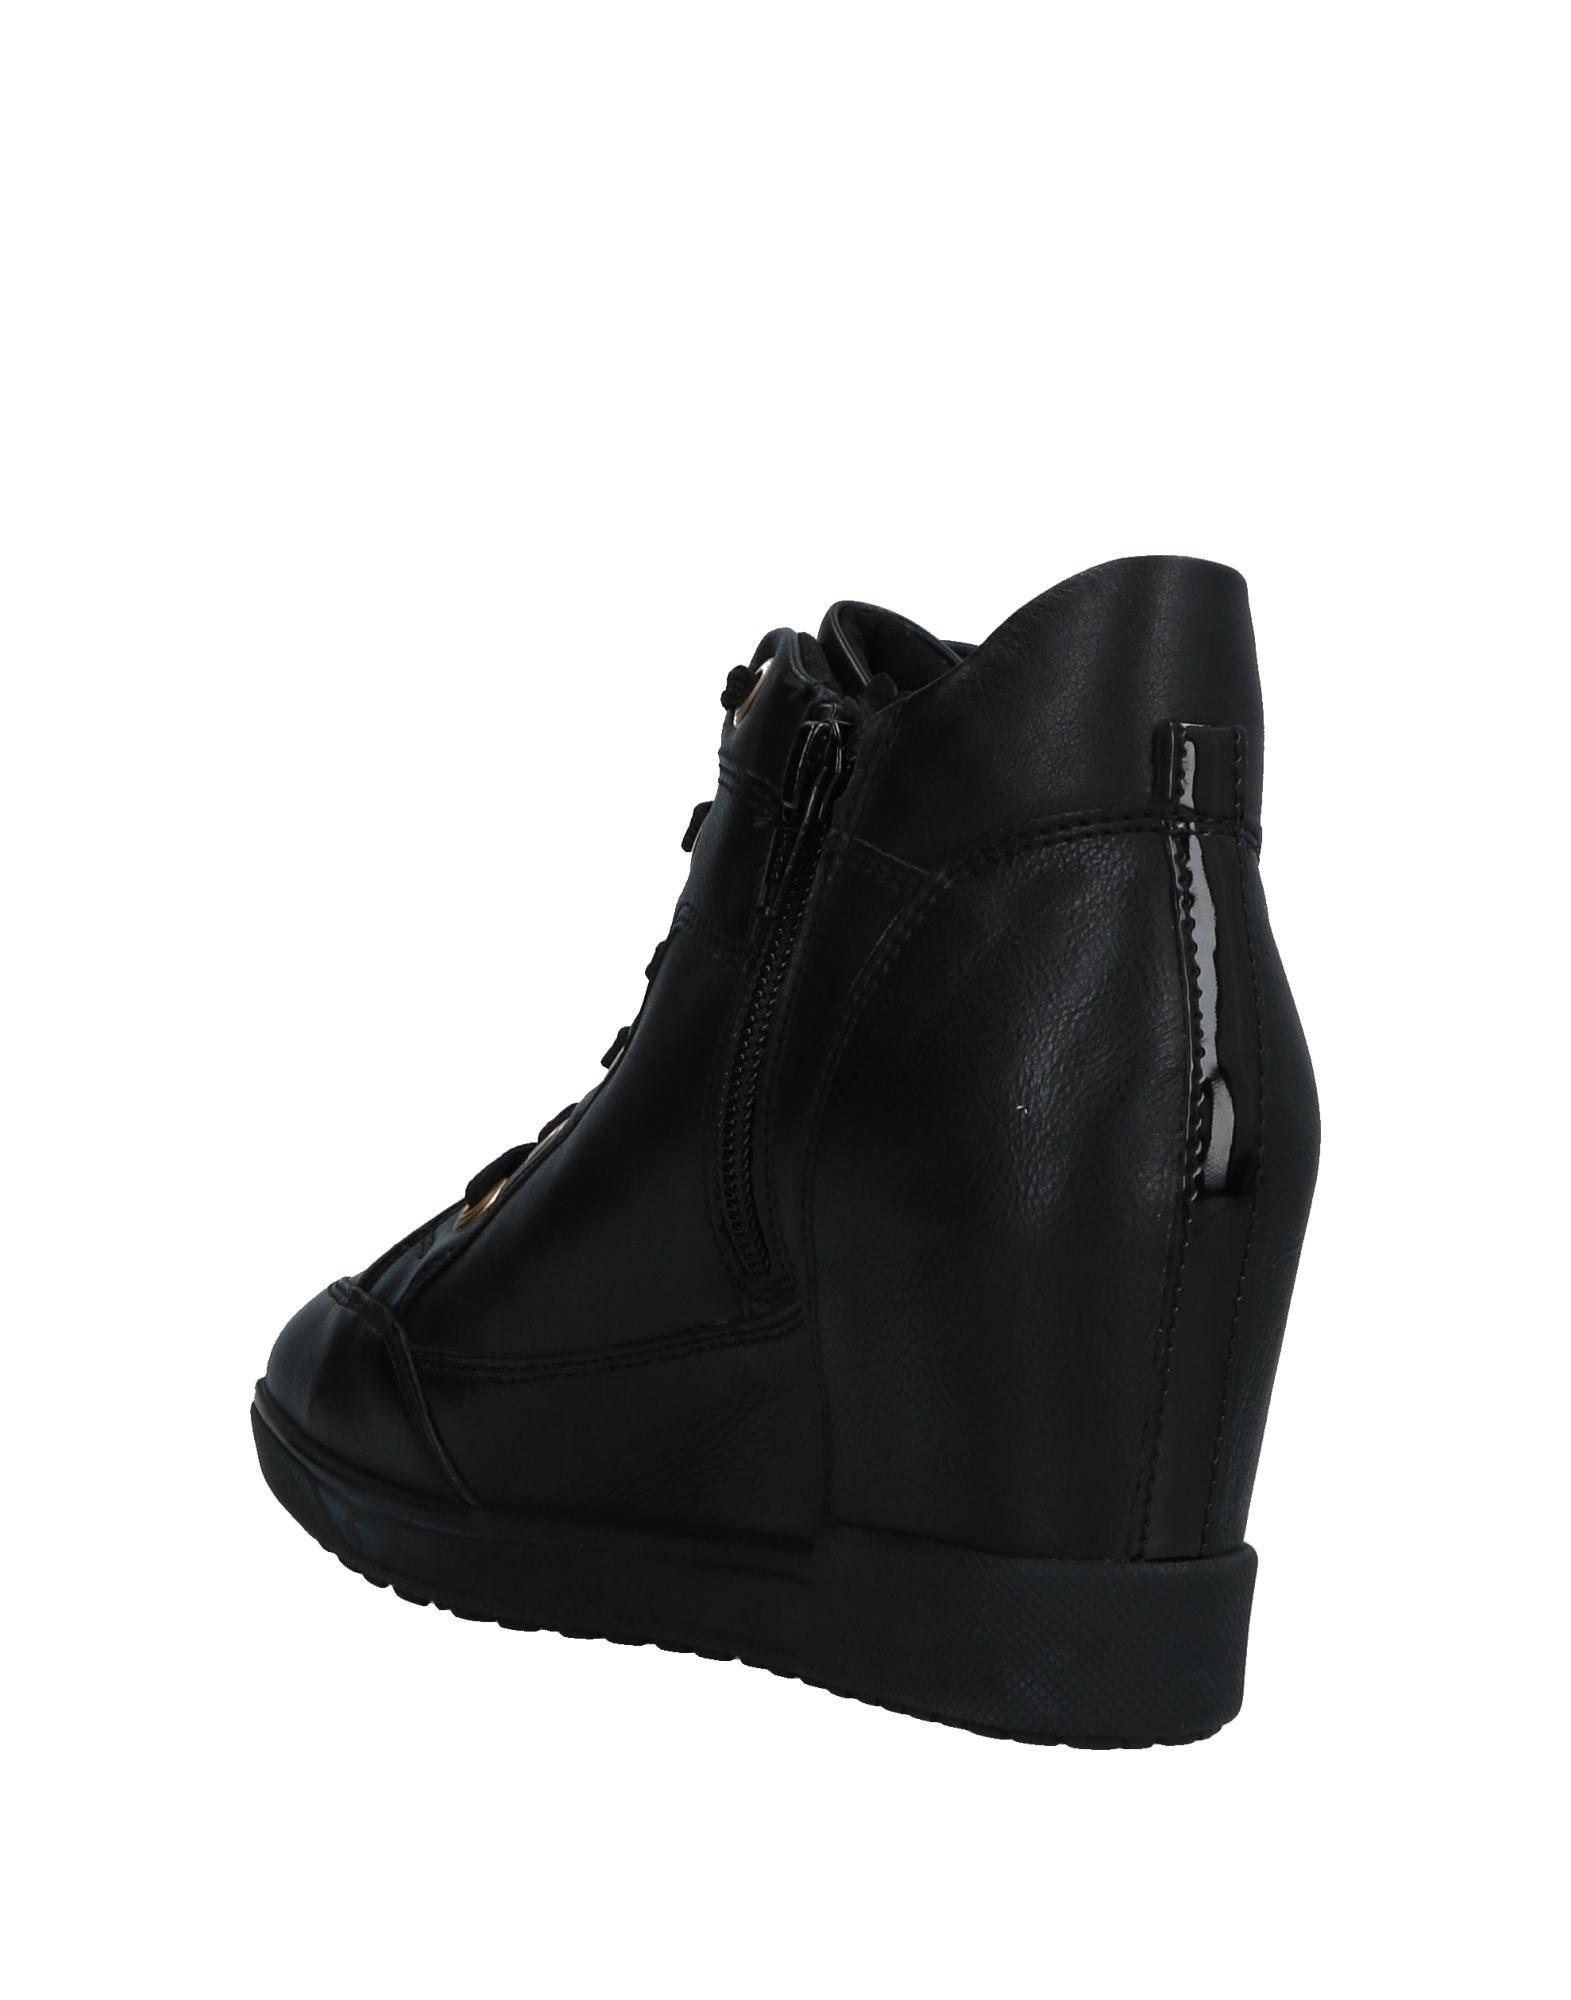 Geox Sneakers - Women Women Women Geox Sneakers online on  United Kingdom - 11577314JM 60b881